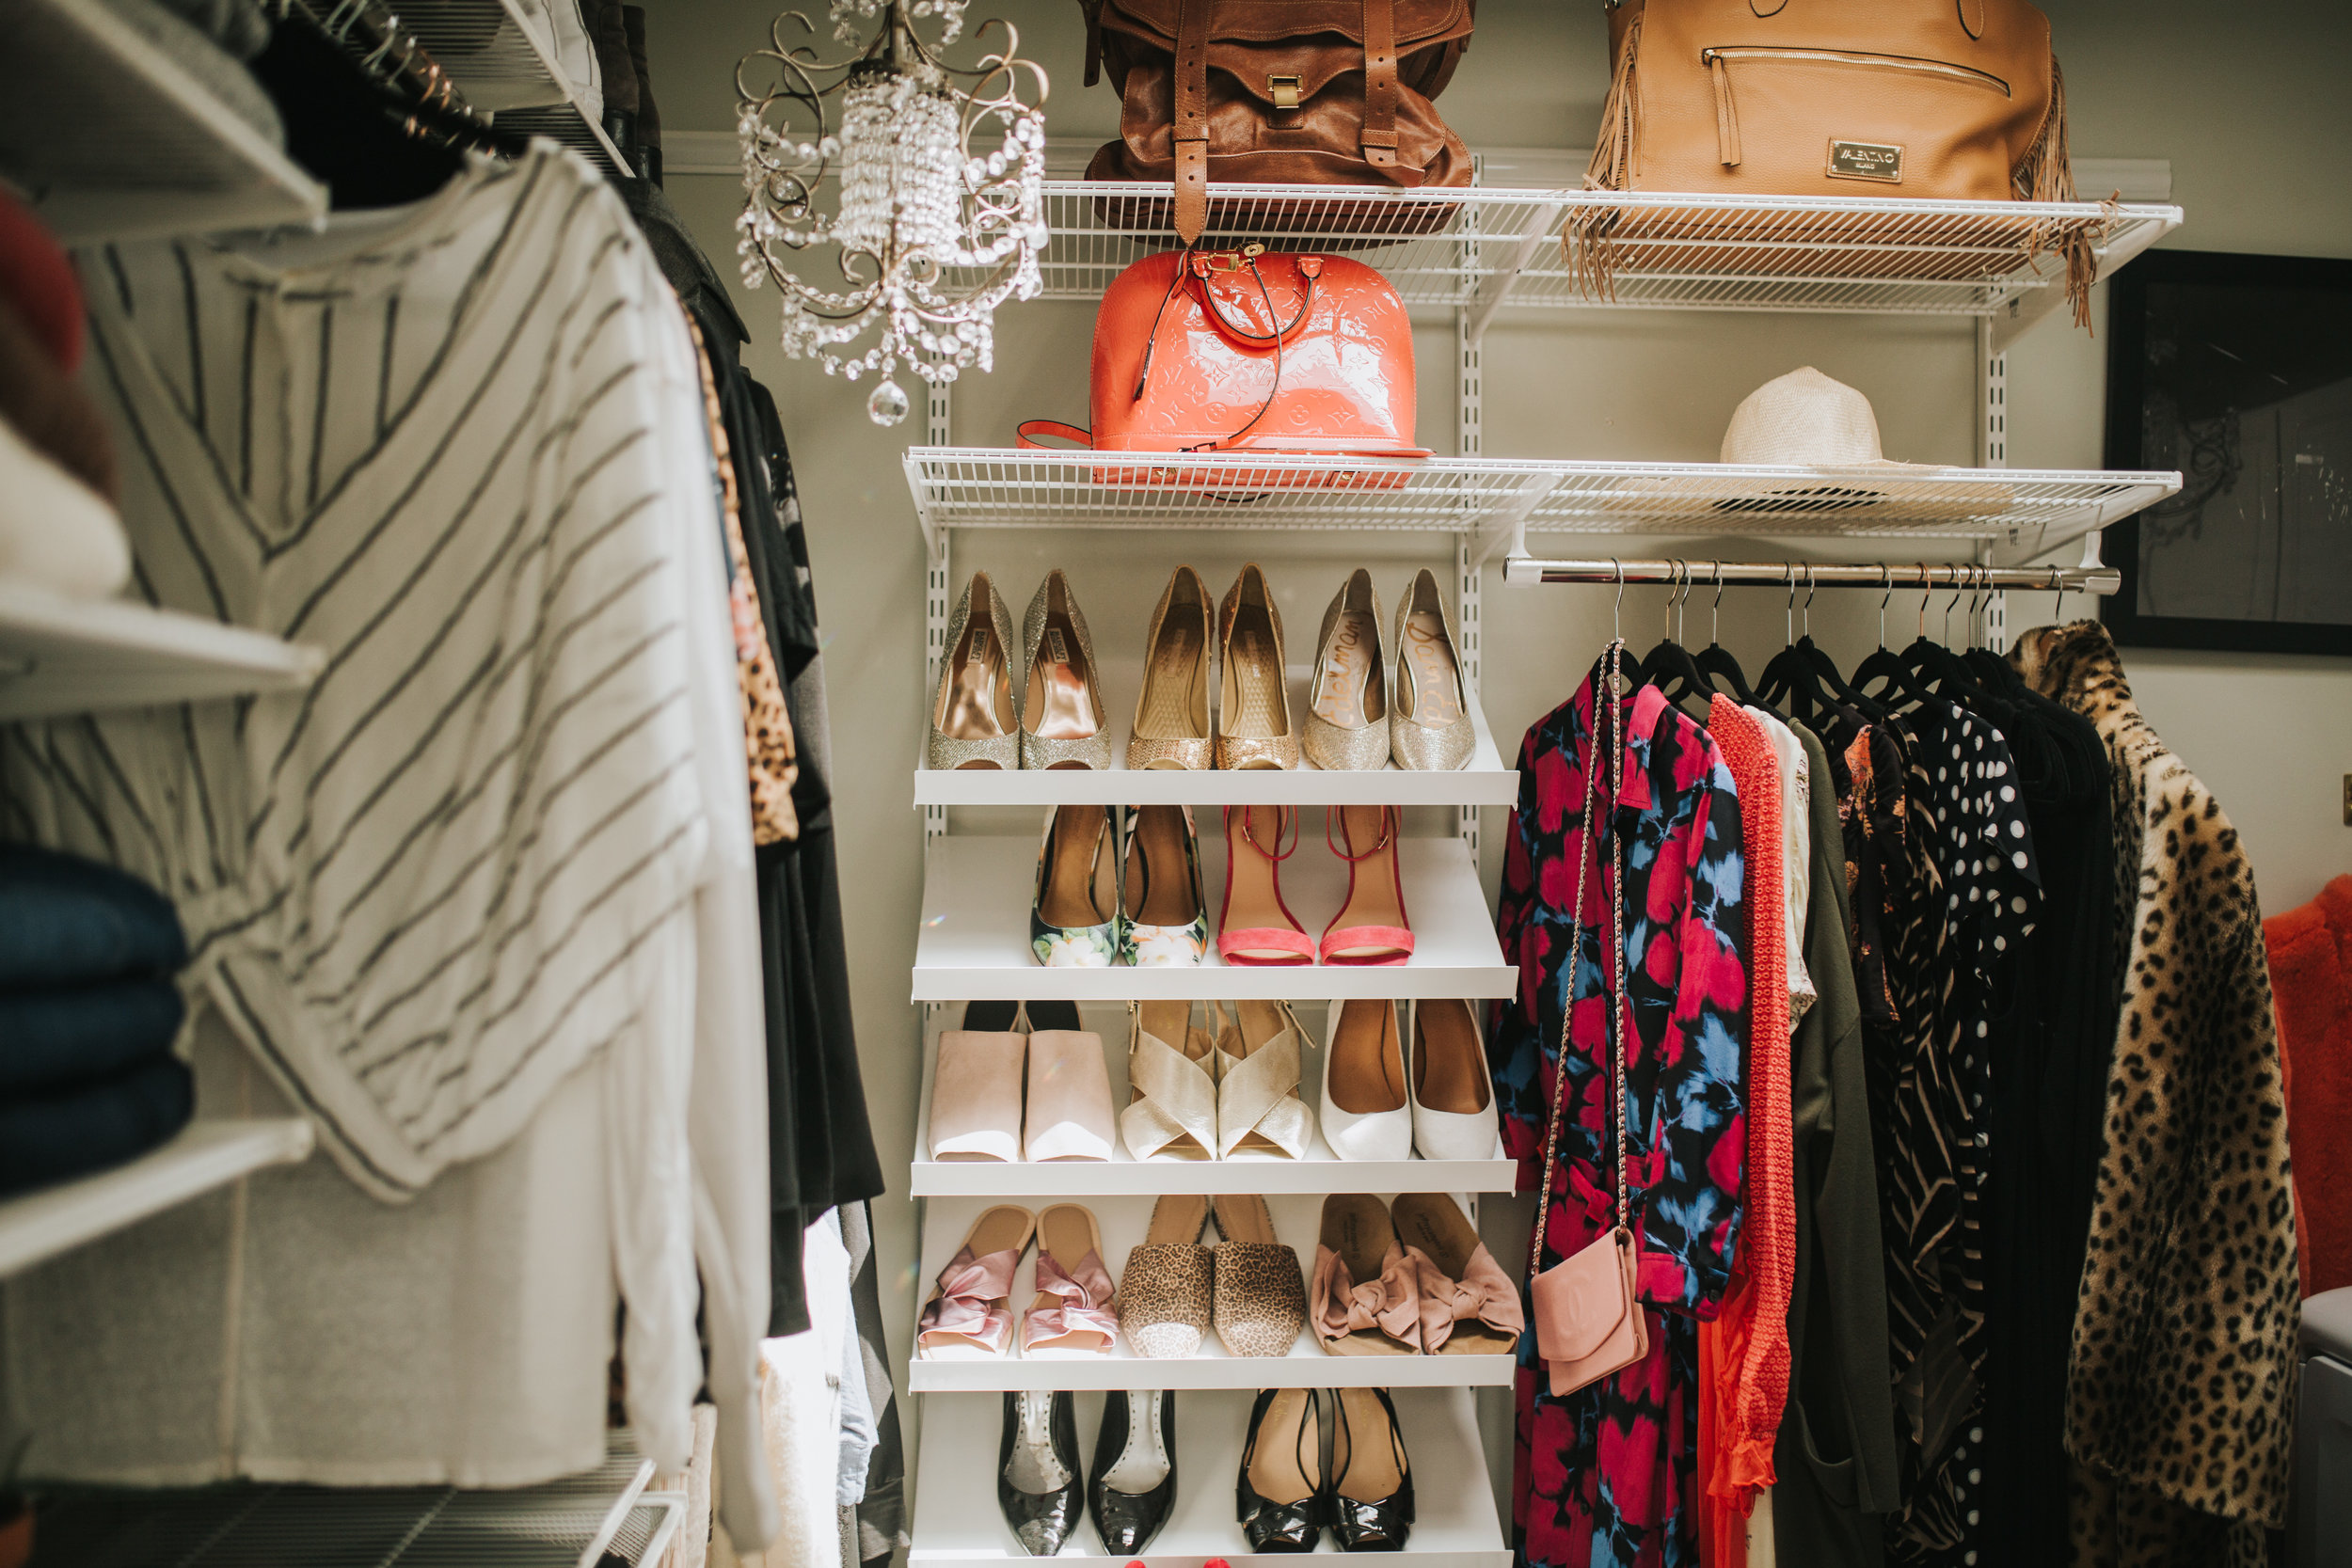 consign-couture-kiararose-store-54.jpg